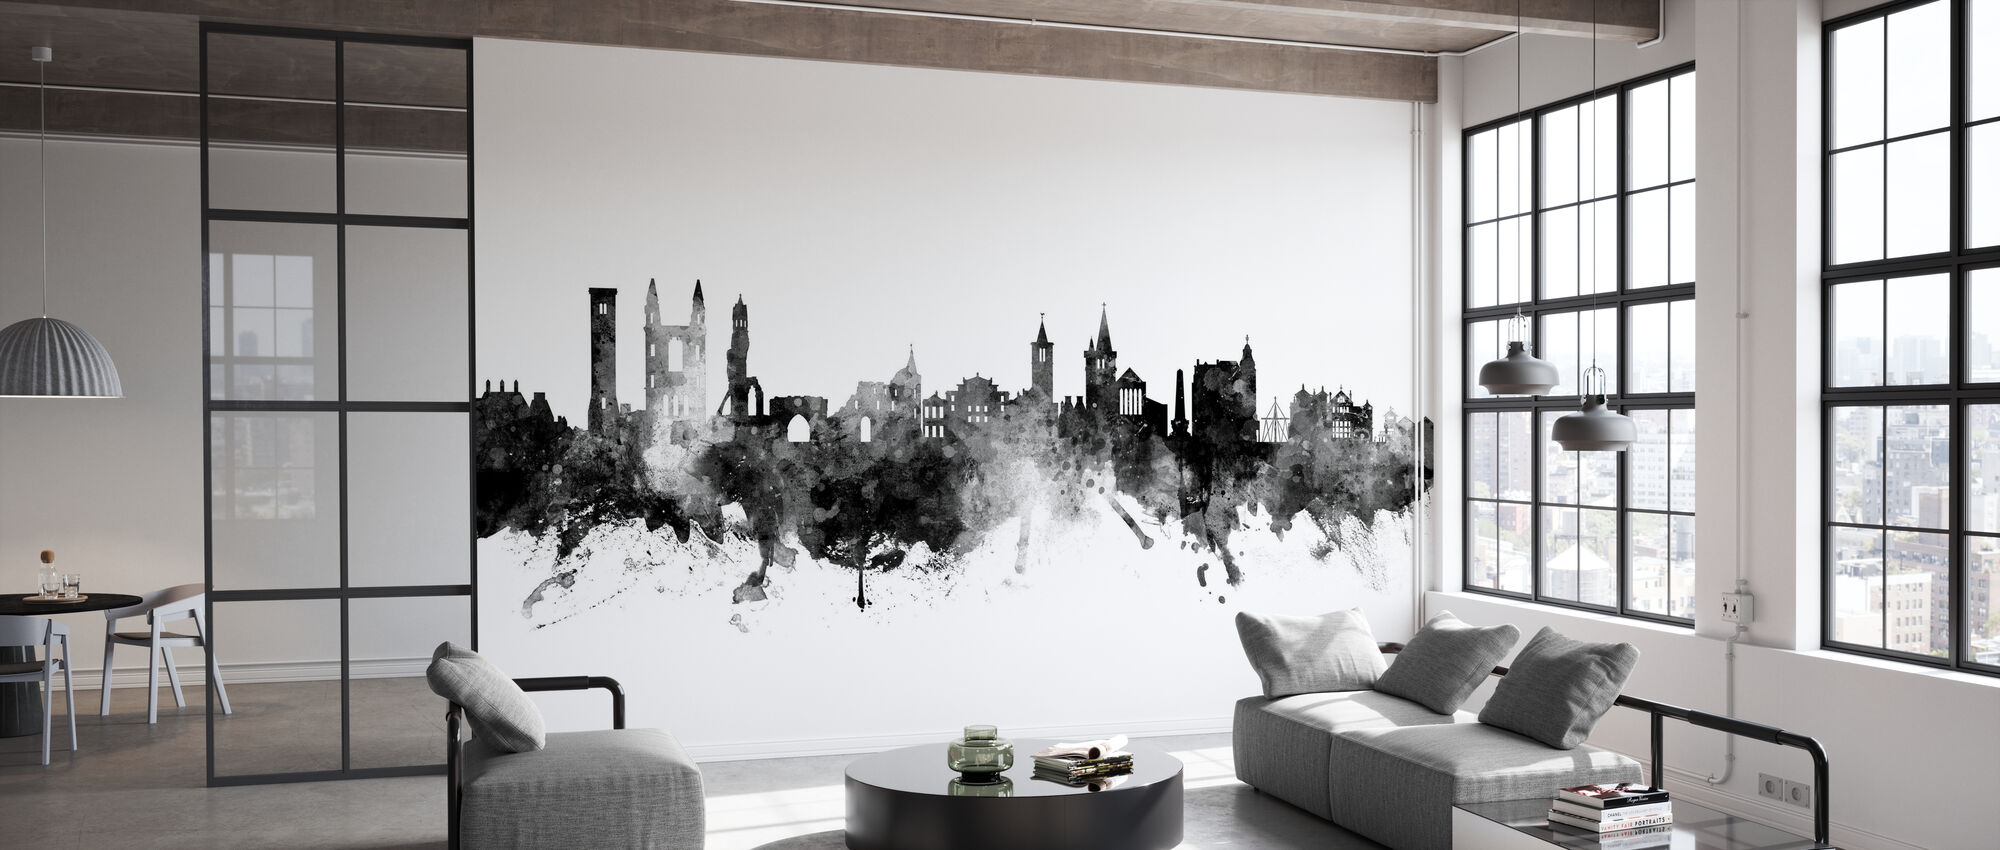 St Andrews Scotland Skyline - Wallpaper - Office